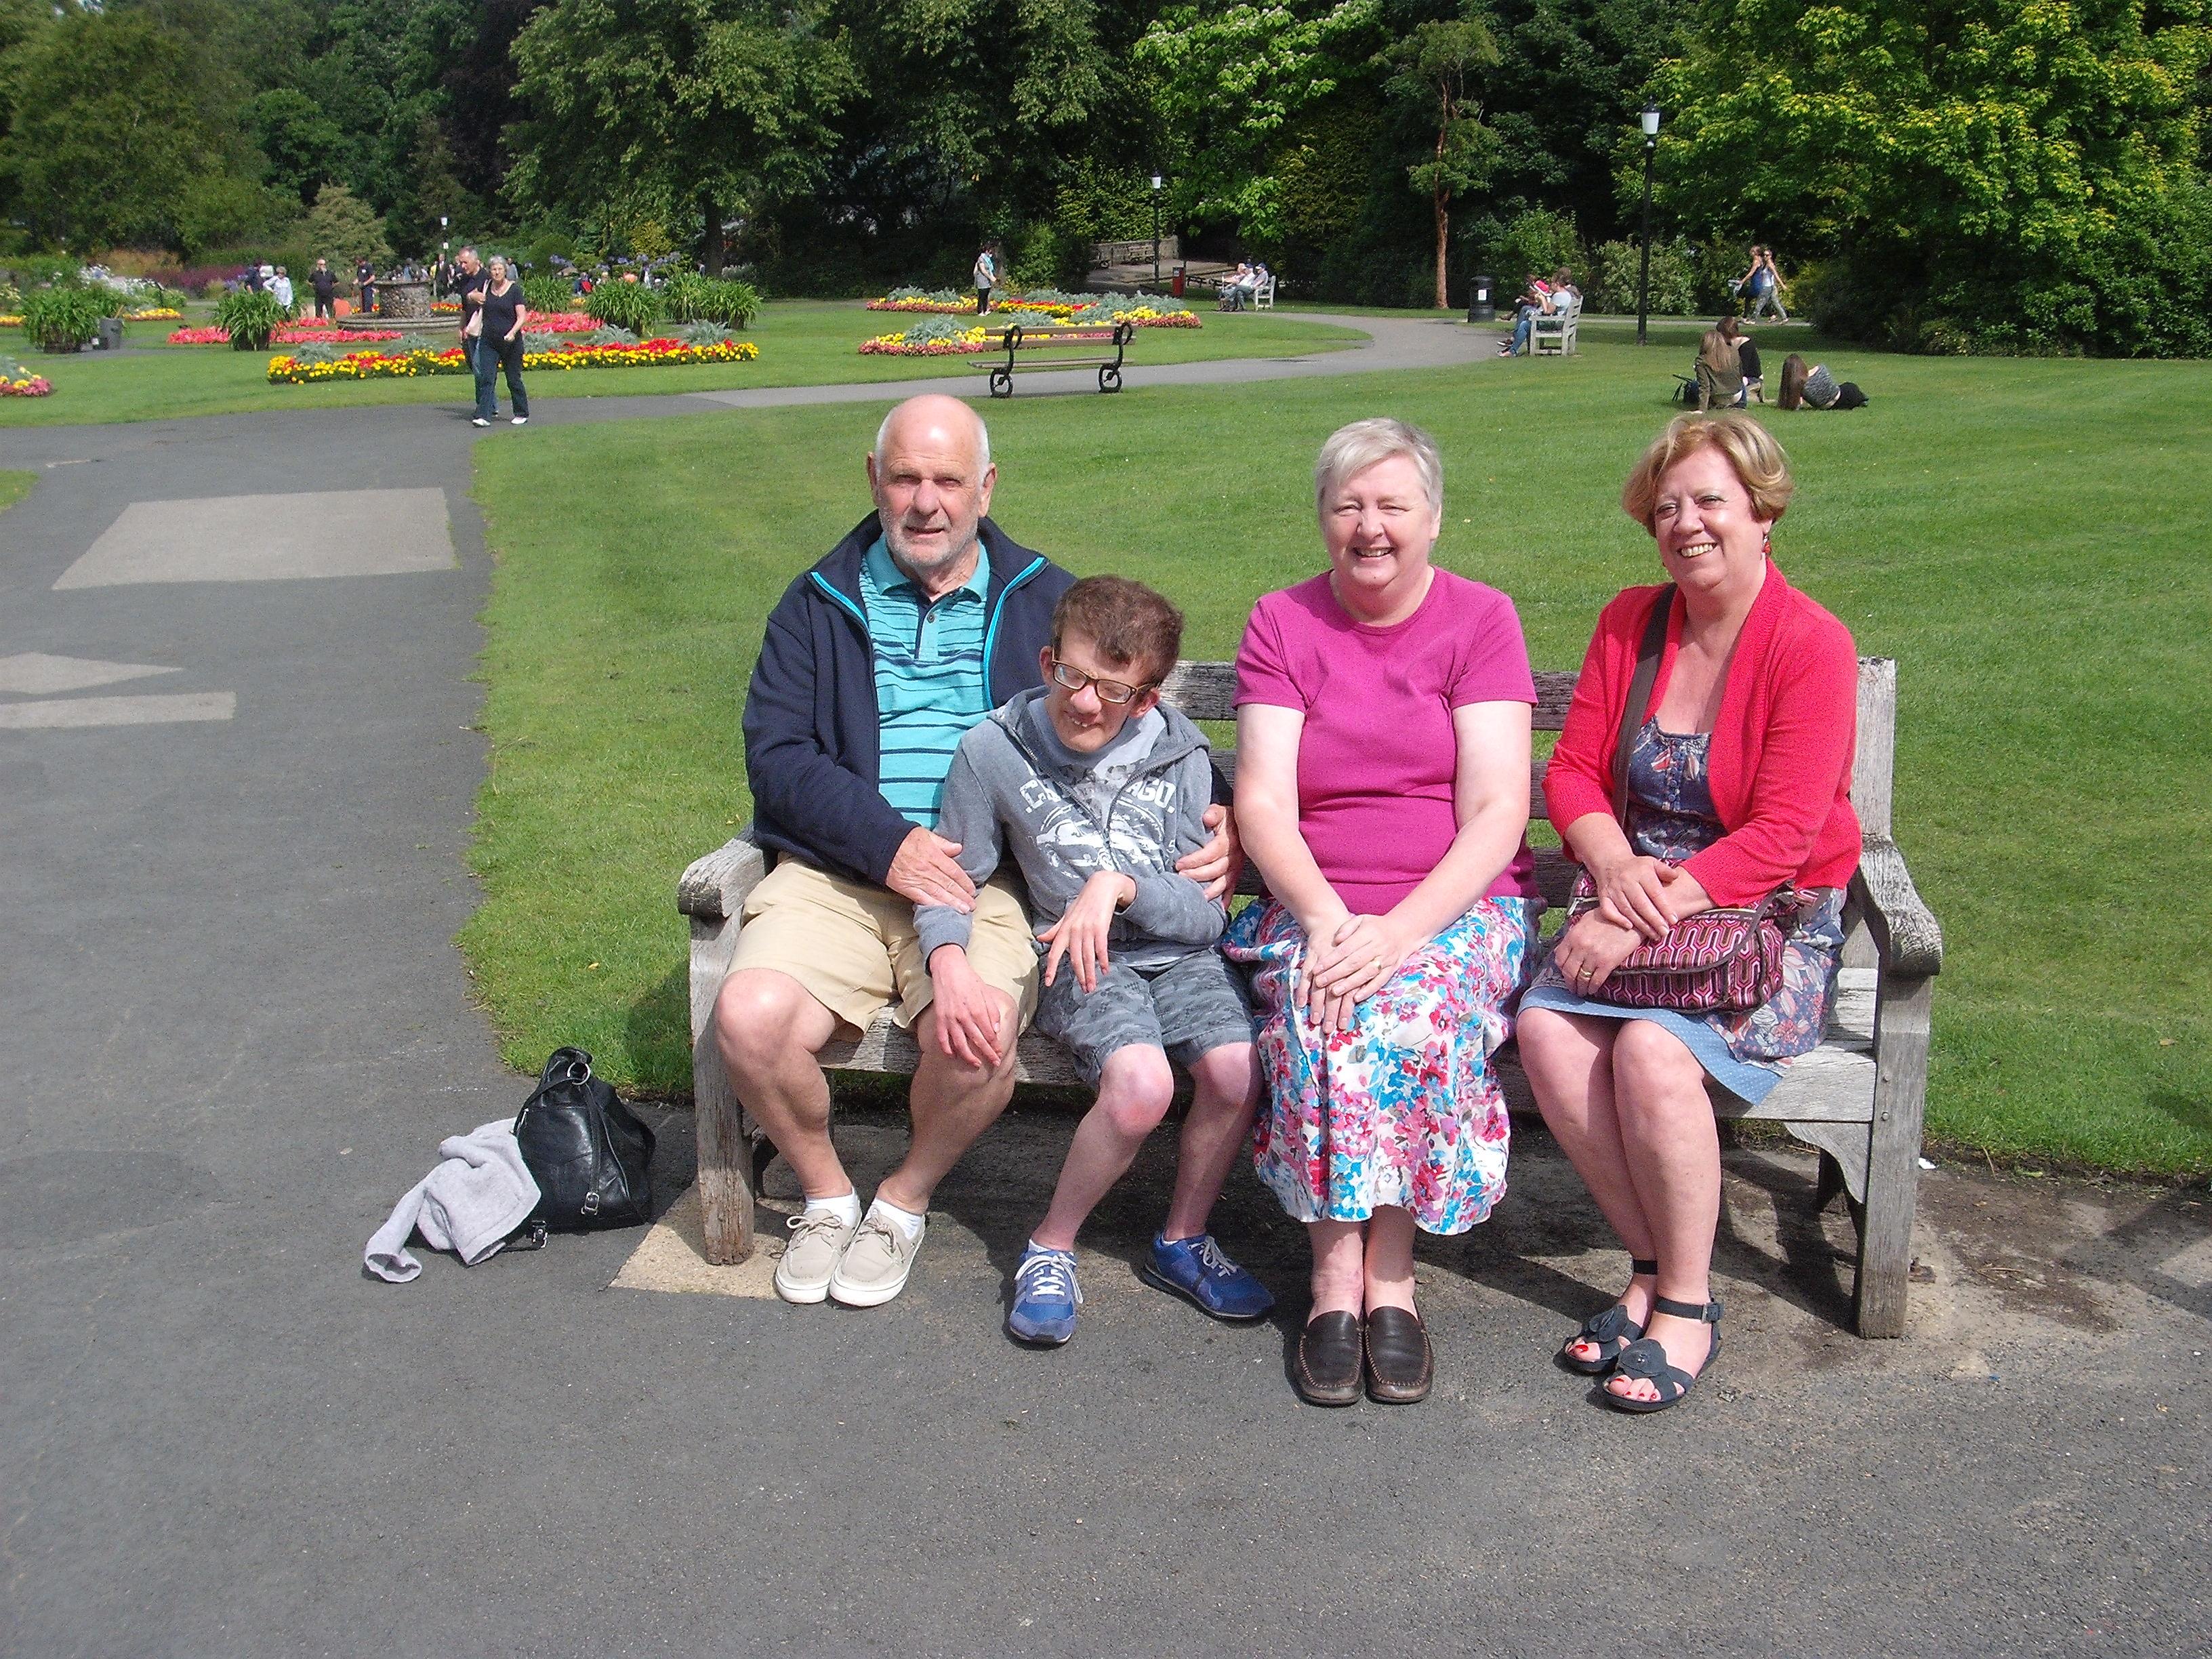 Alec, Edward, Annette and Carole